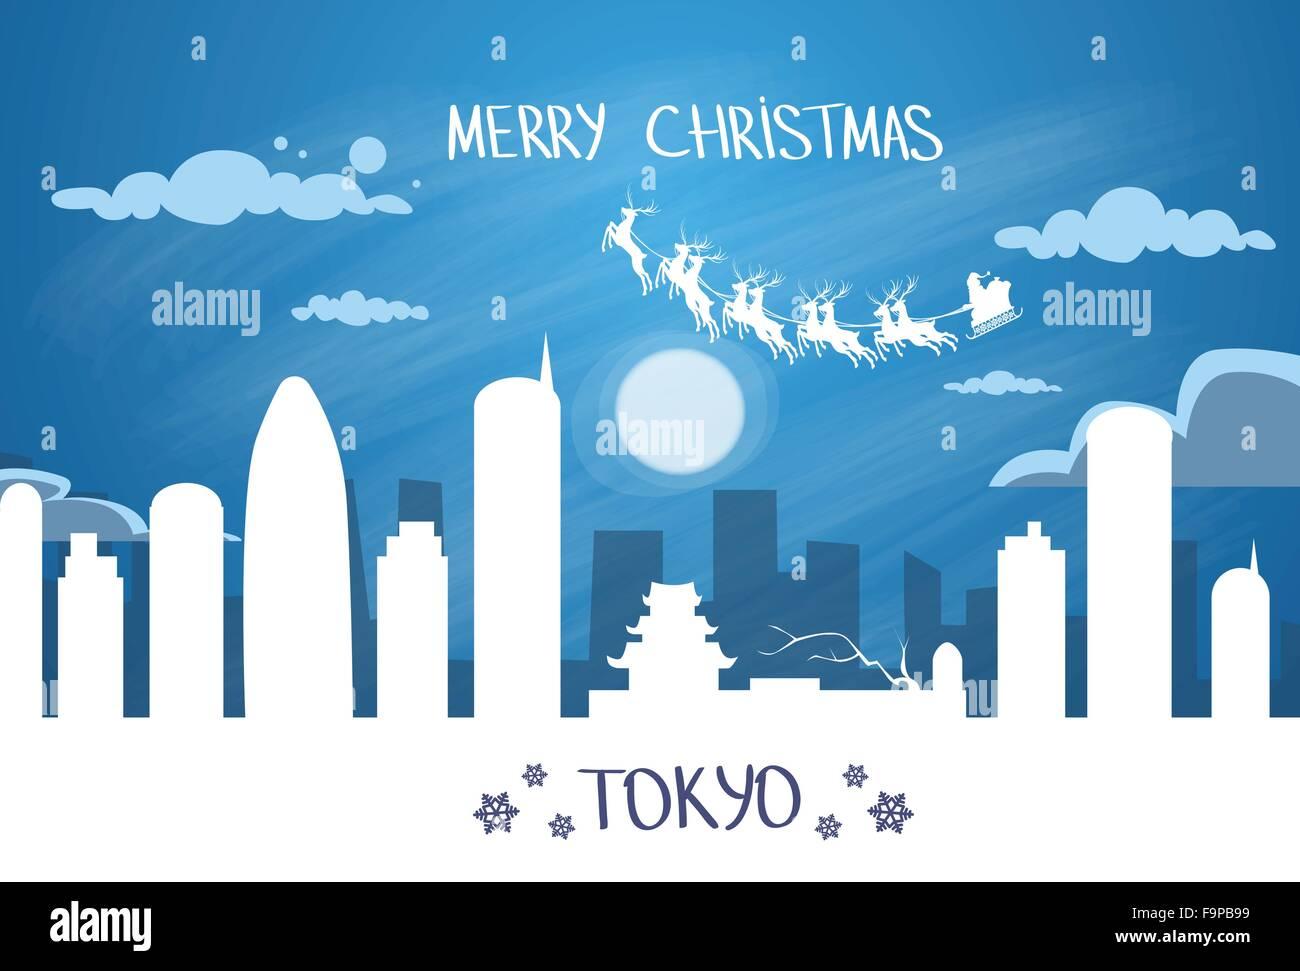 Santa Claus Sleigh Reindeer Fly Japan Sky over Tokyo City Silhouette Night - Stock Image